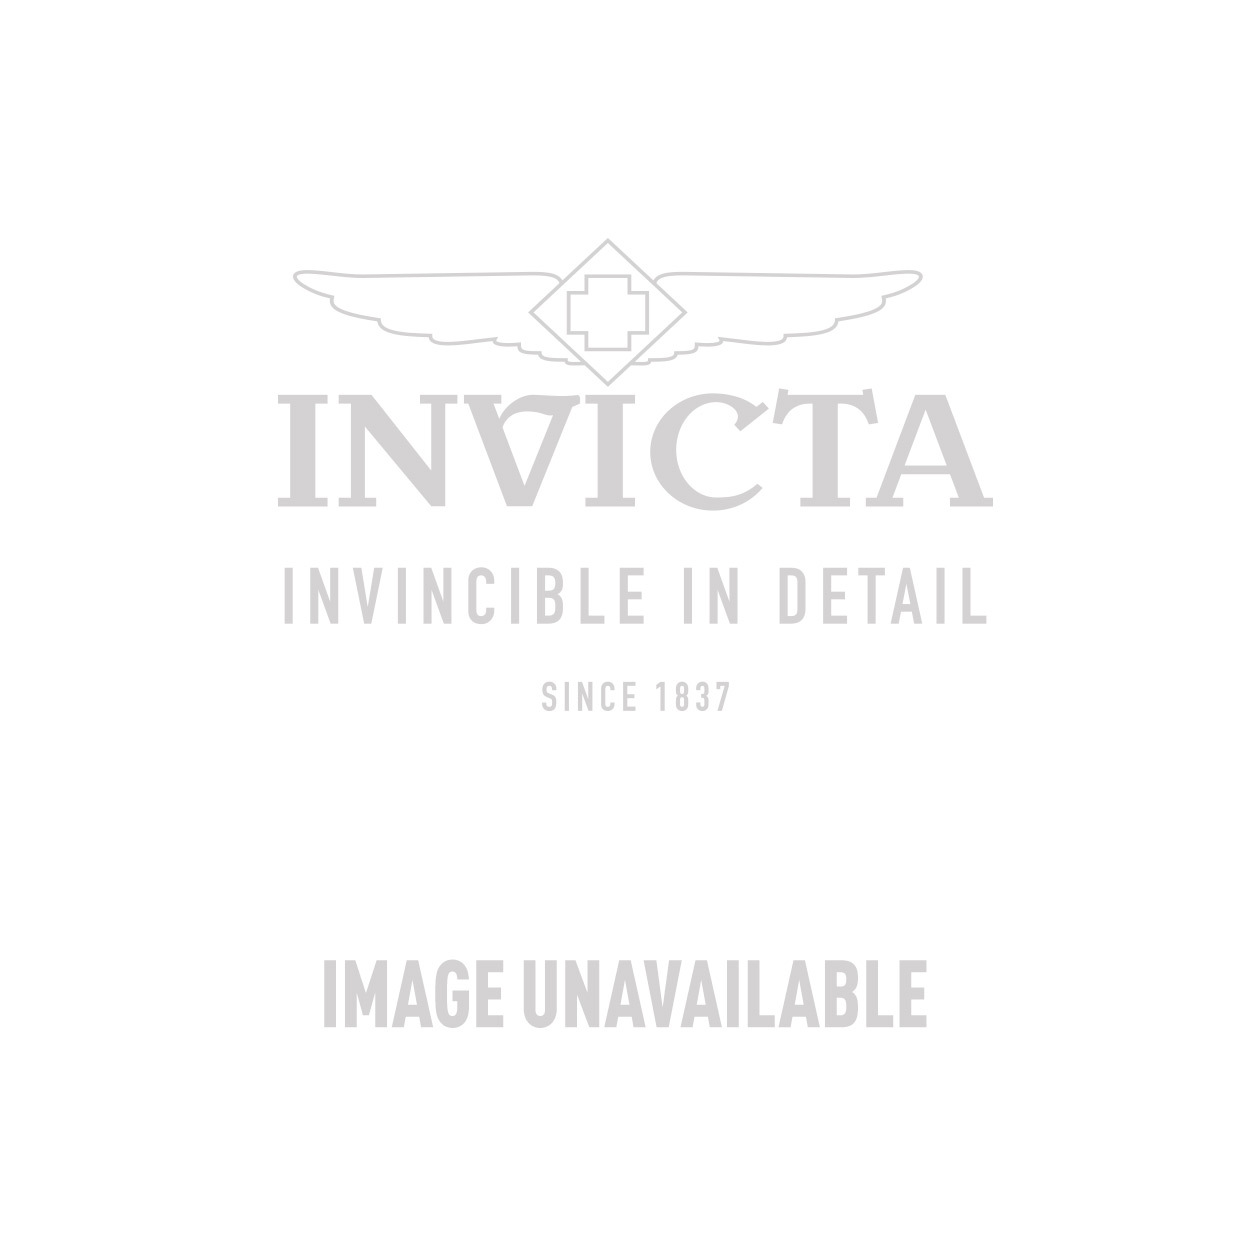 Invicta Subaqua Swiss Made Quartz Watch - Gold, Black case with Black tone Polyurethane band - Model 0917